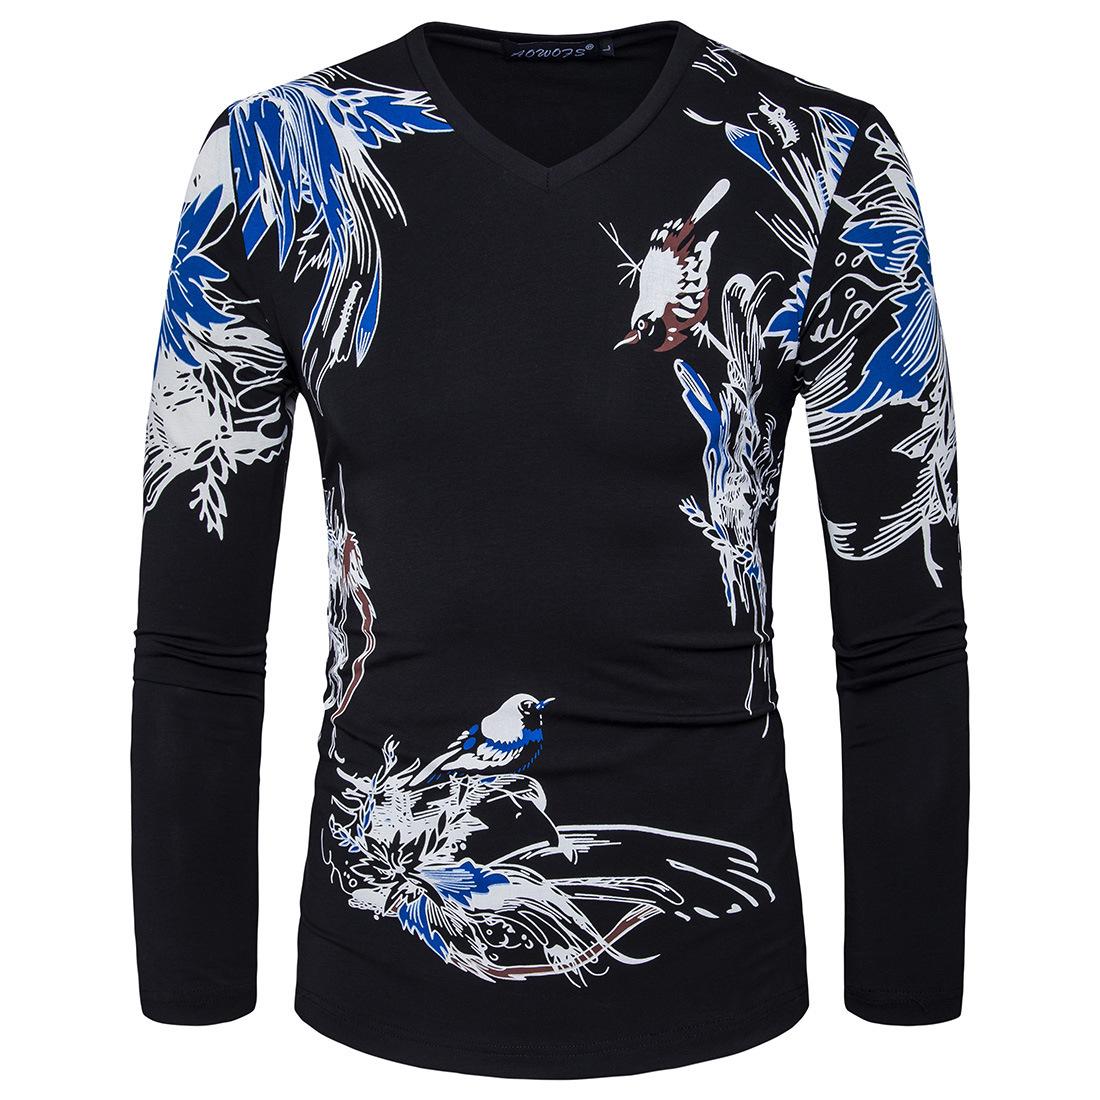 Design shirt v neck - Men Long Sleeve V Neck Printflower Designer Casual T Shirt Fashion White Black Slim Cotton T Shirt S Xxl D059